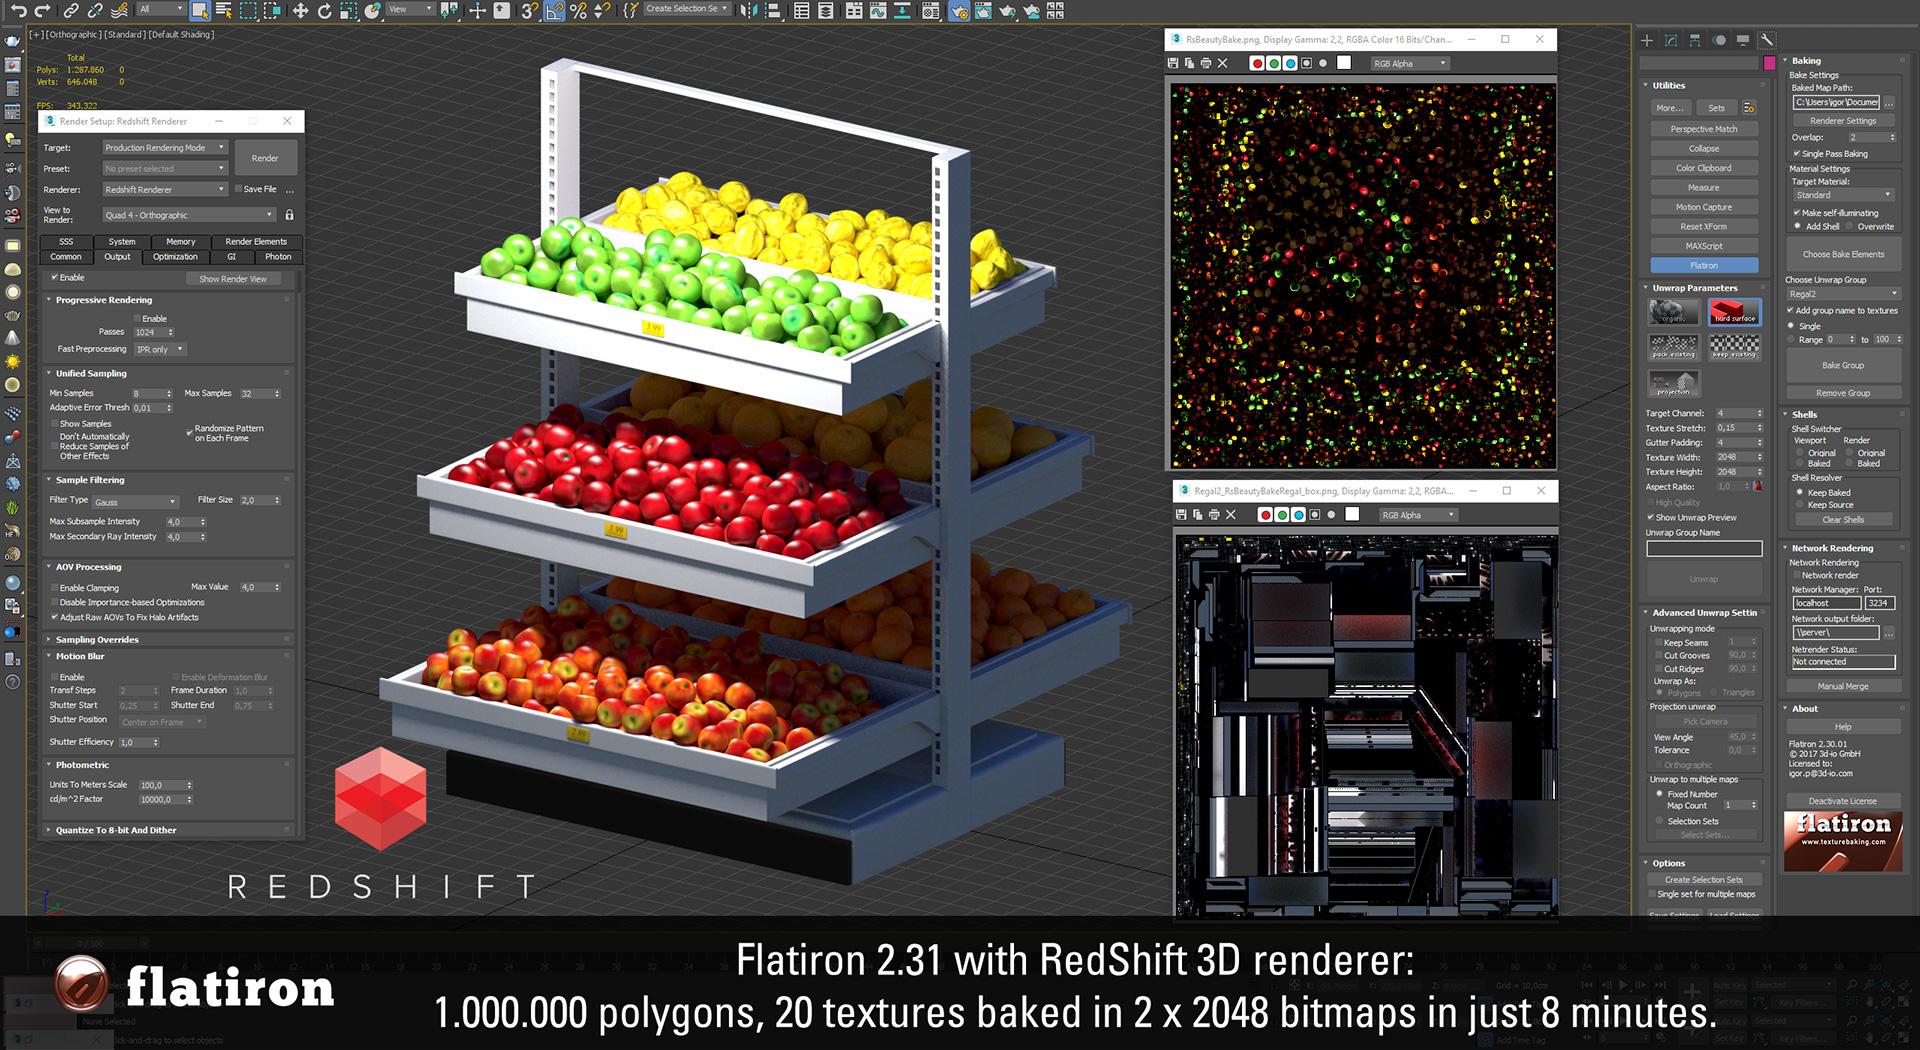 FlatIron 2.31 with Redsift 3d texture baking support